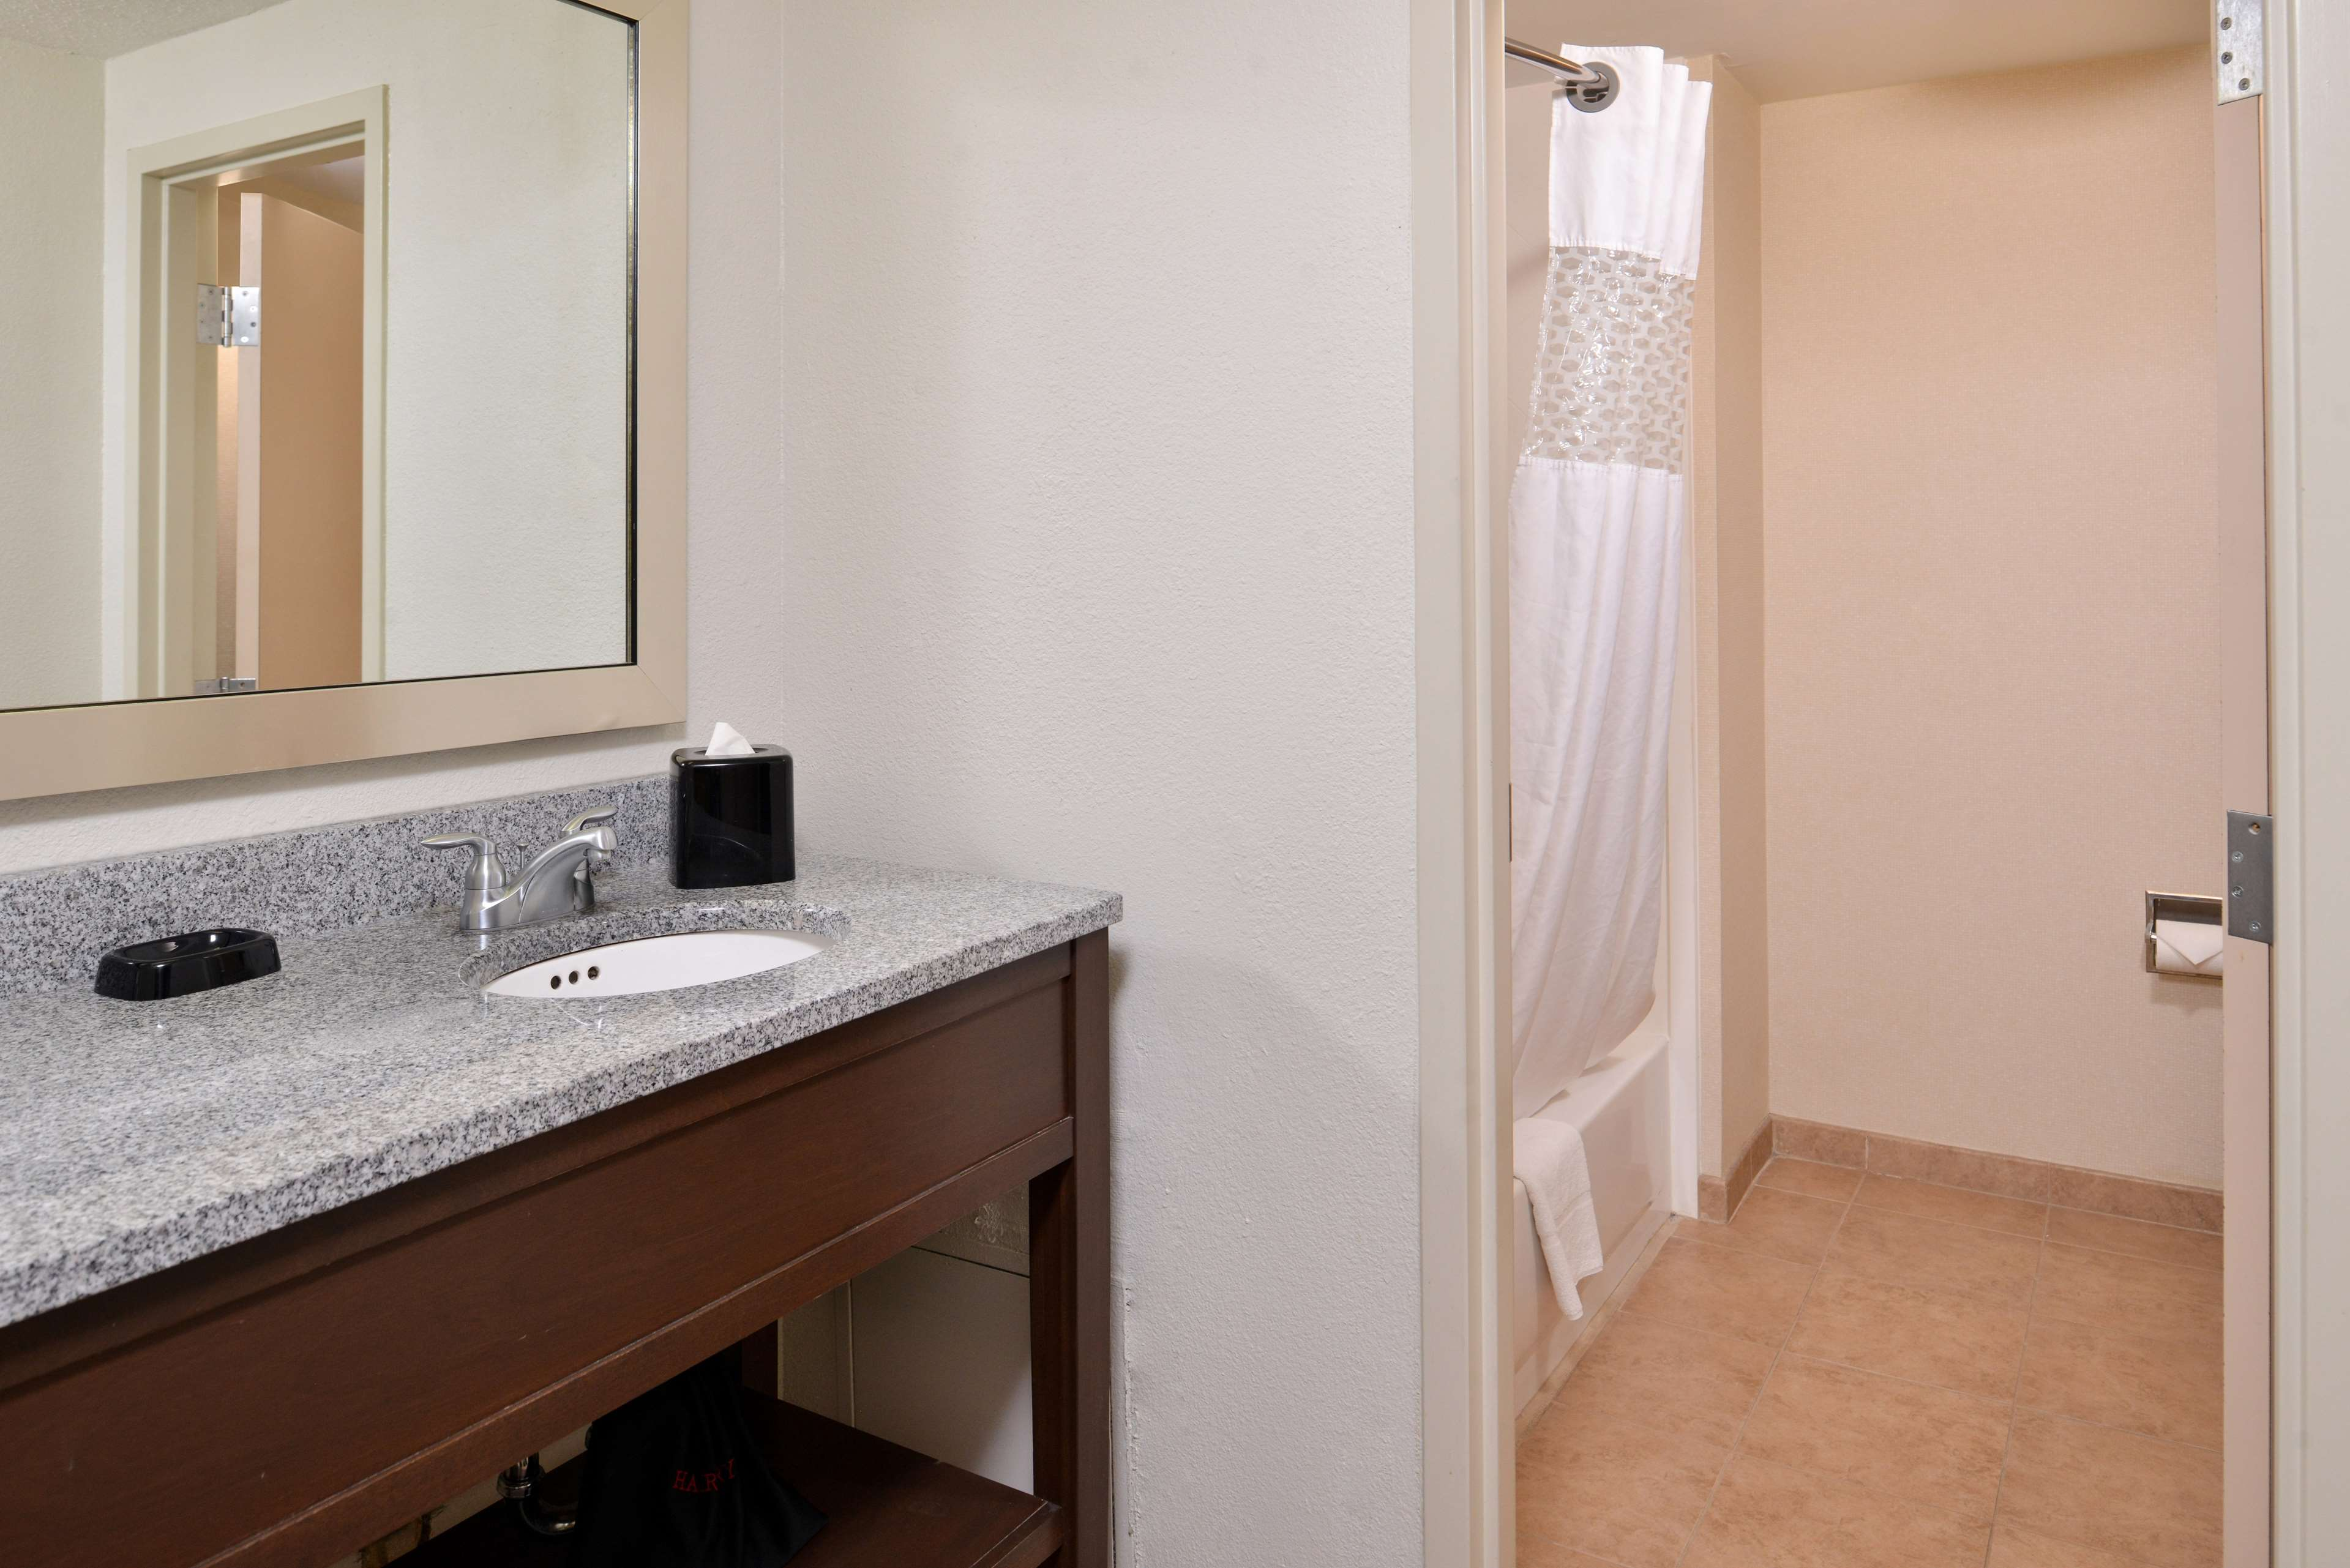 Hampton Inn & Suites Newport News (Oyster Point) image 28